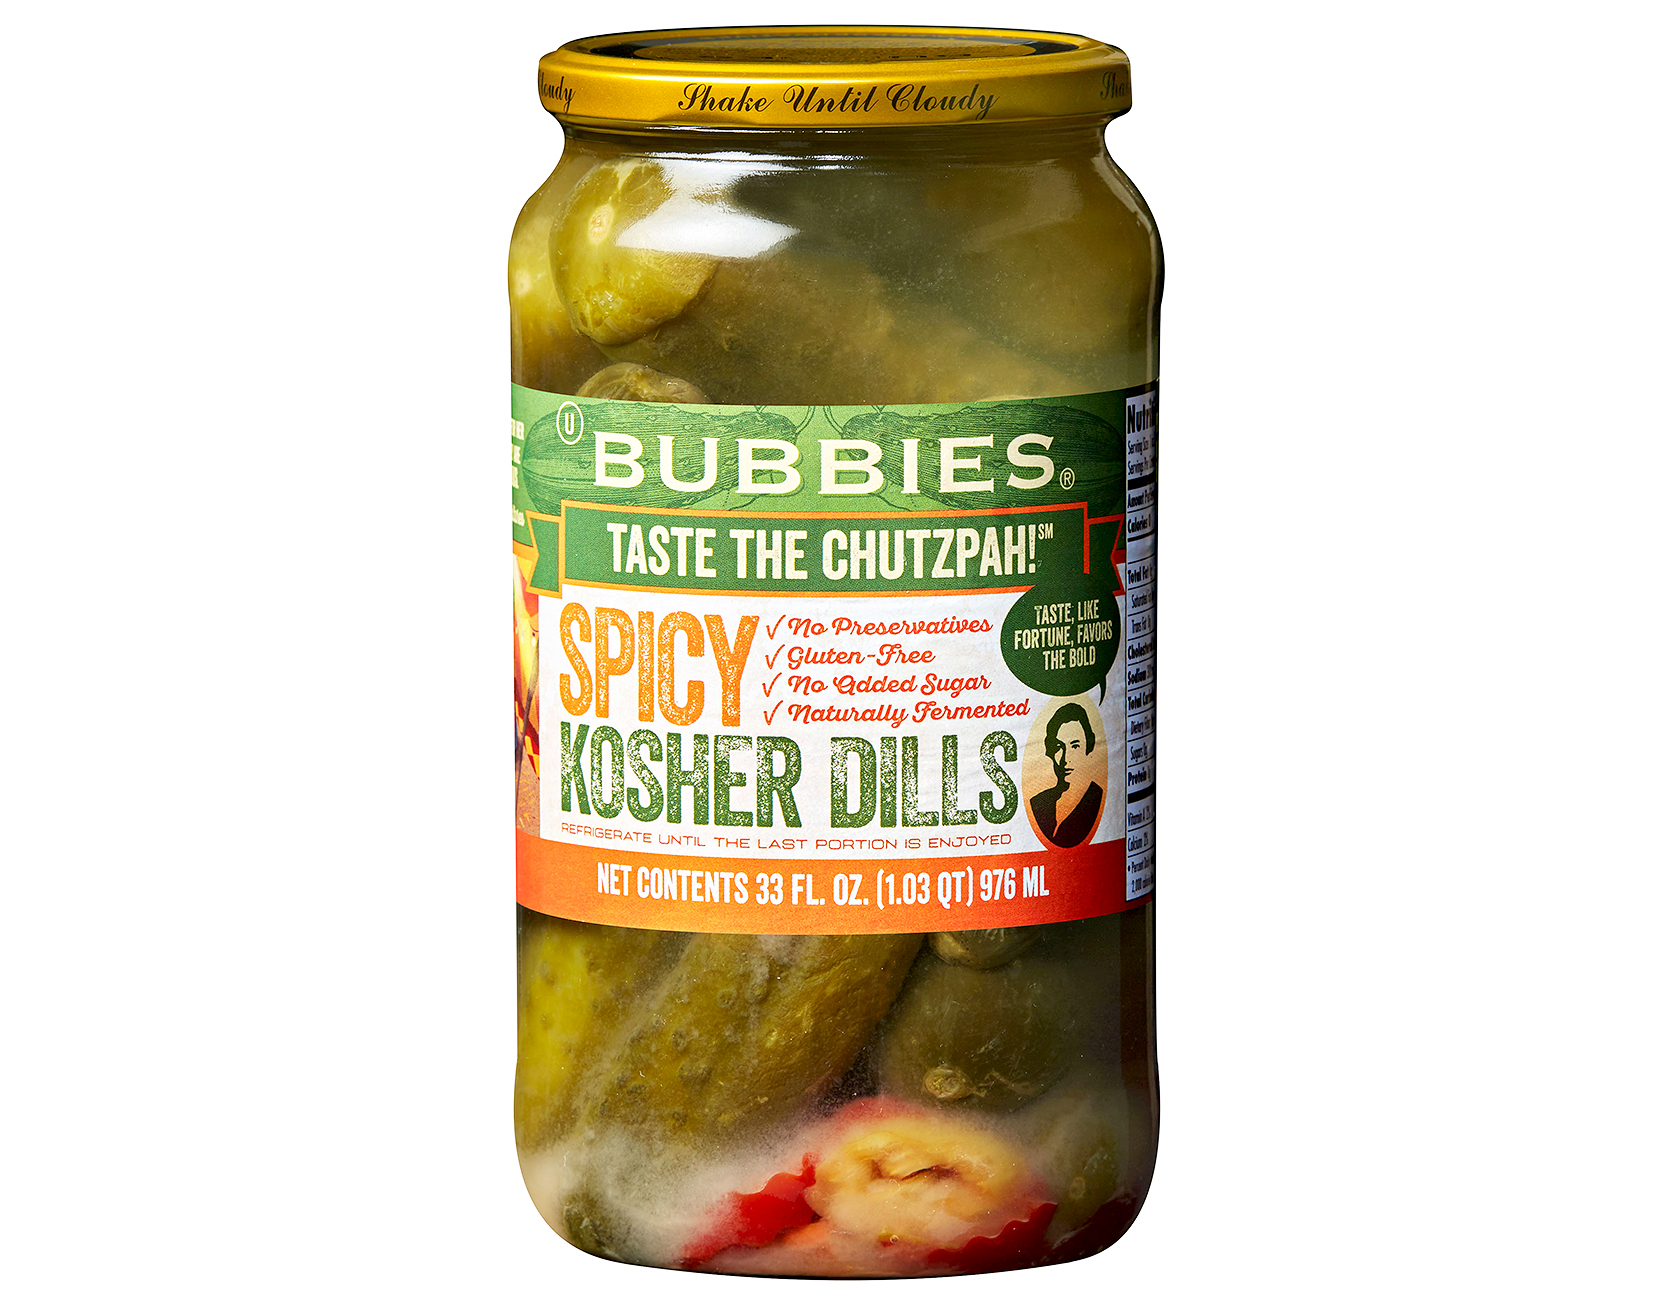 bubbies spicy kosher dill pickles jar